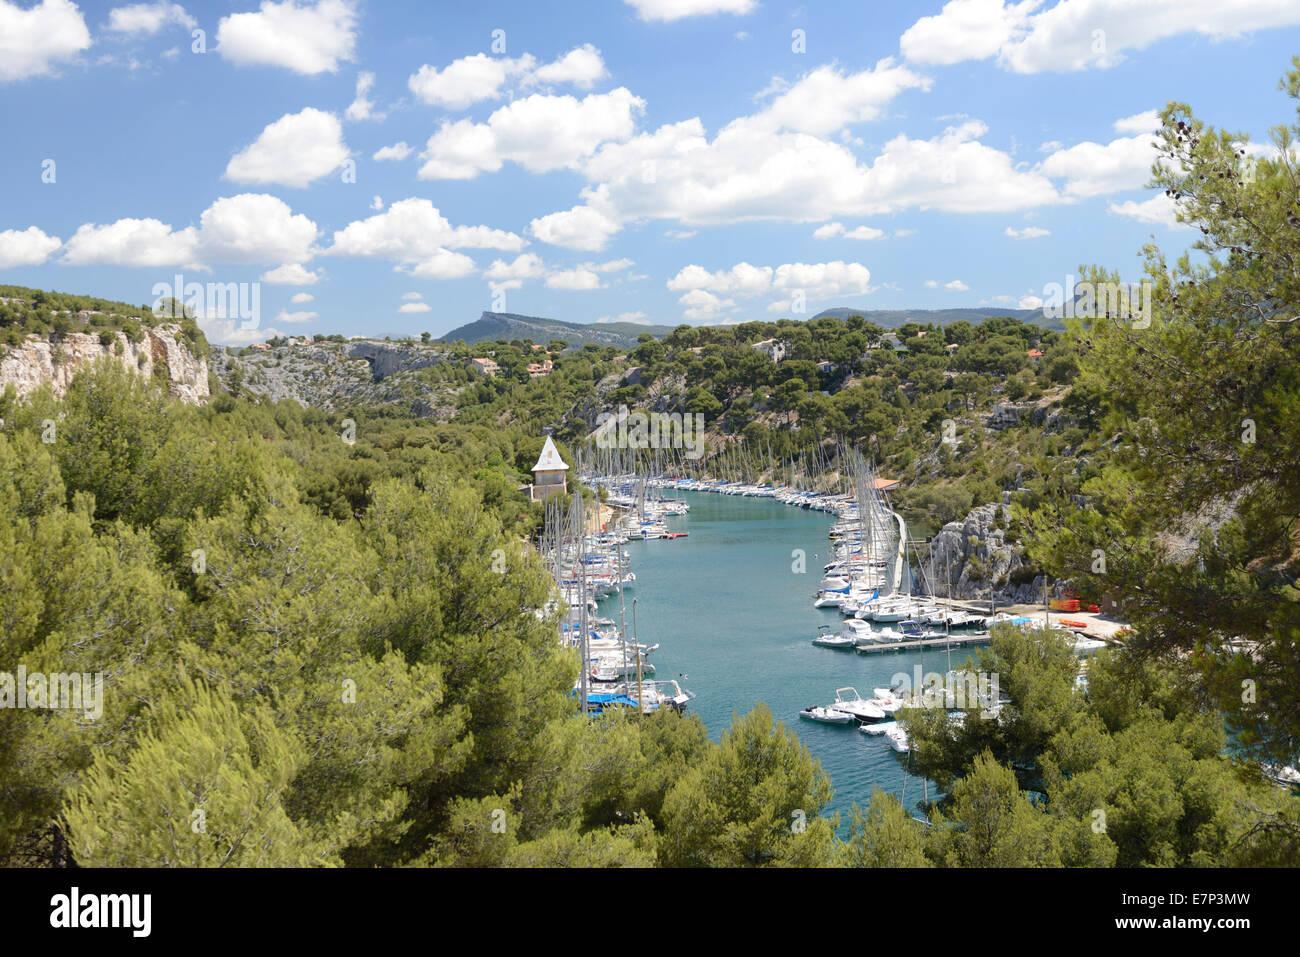 Europe, France, Provence-Alpes-Côte d'Azur, Provence, Cassis, Calanque, Port Miou, port, harbour, yachting, - Stock Image